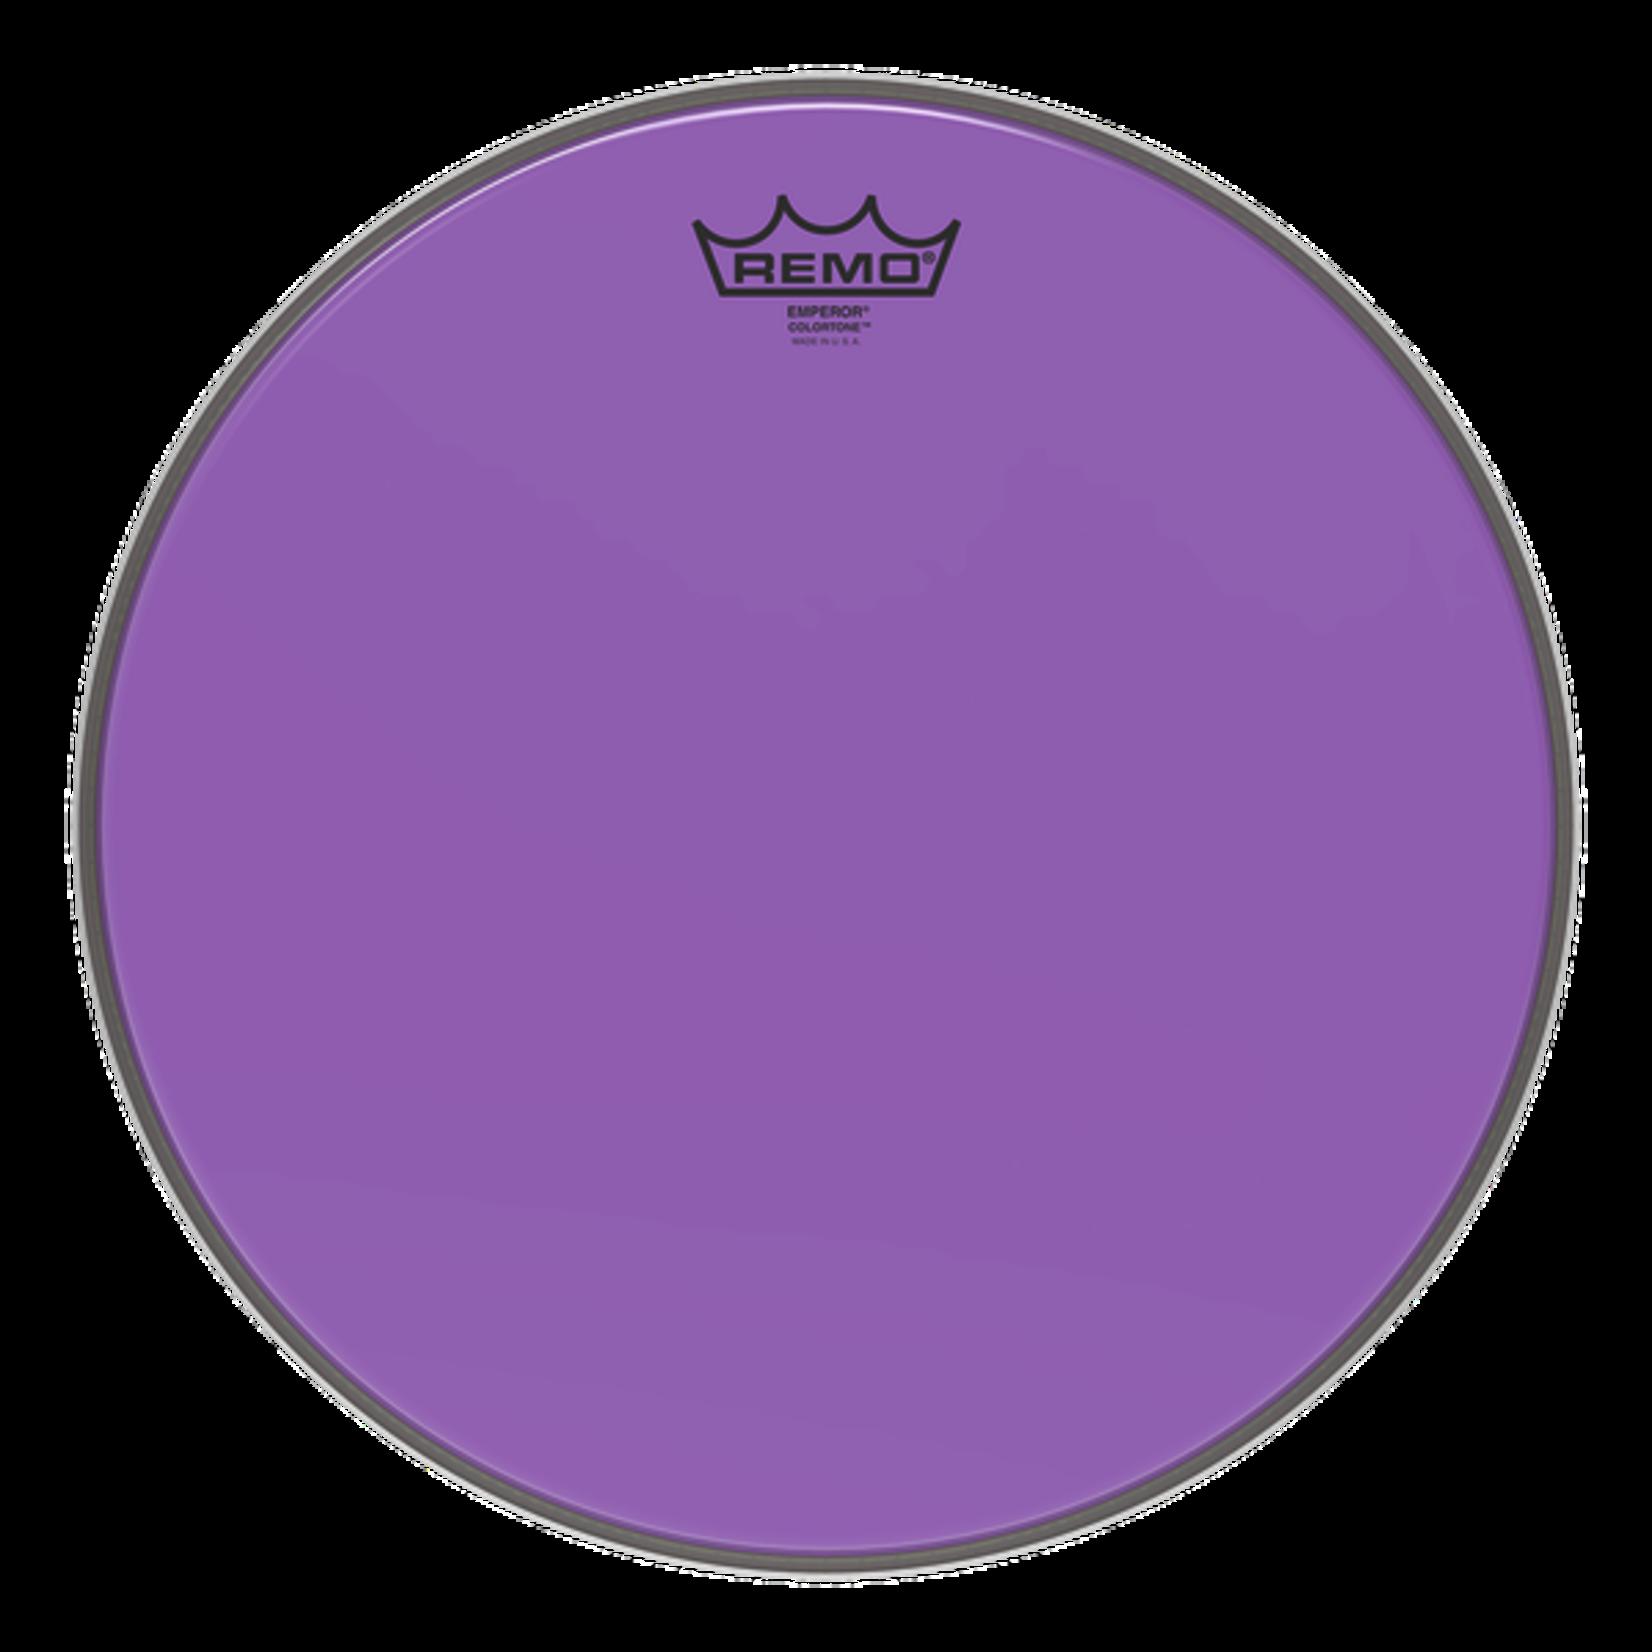 Remo Remo Colortone Emperor